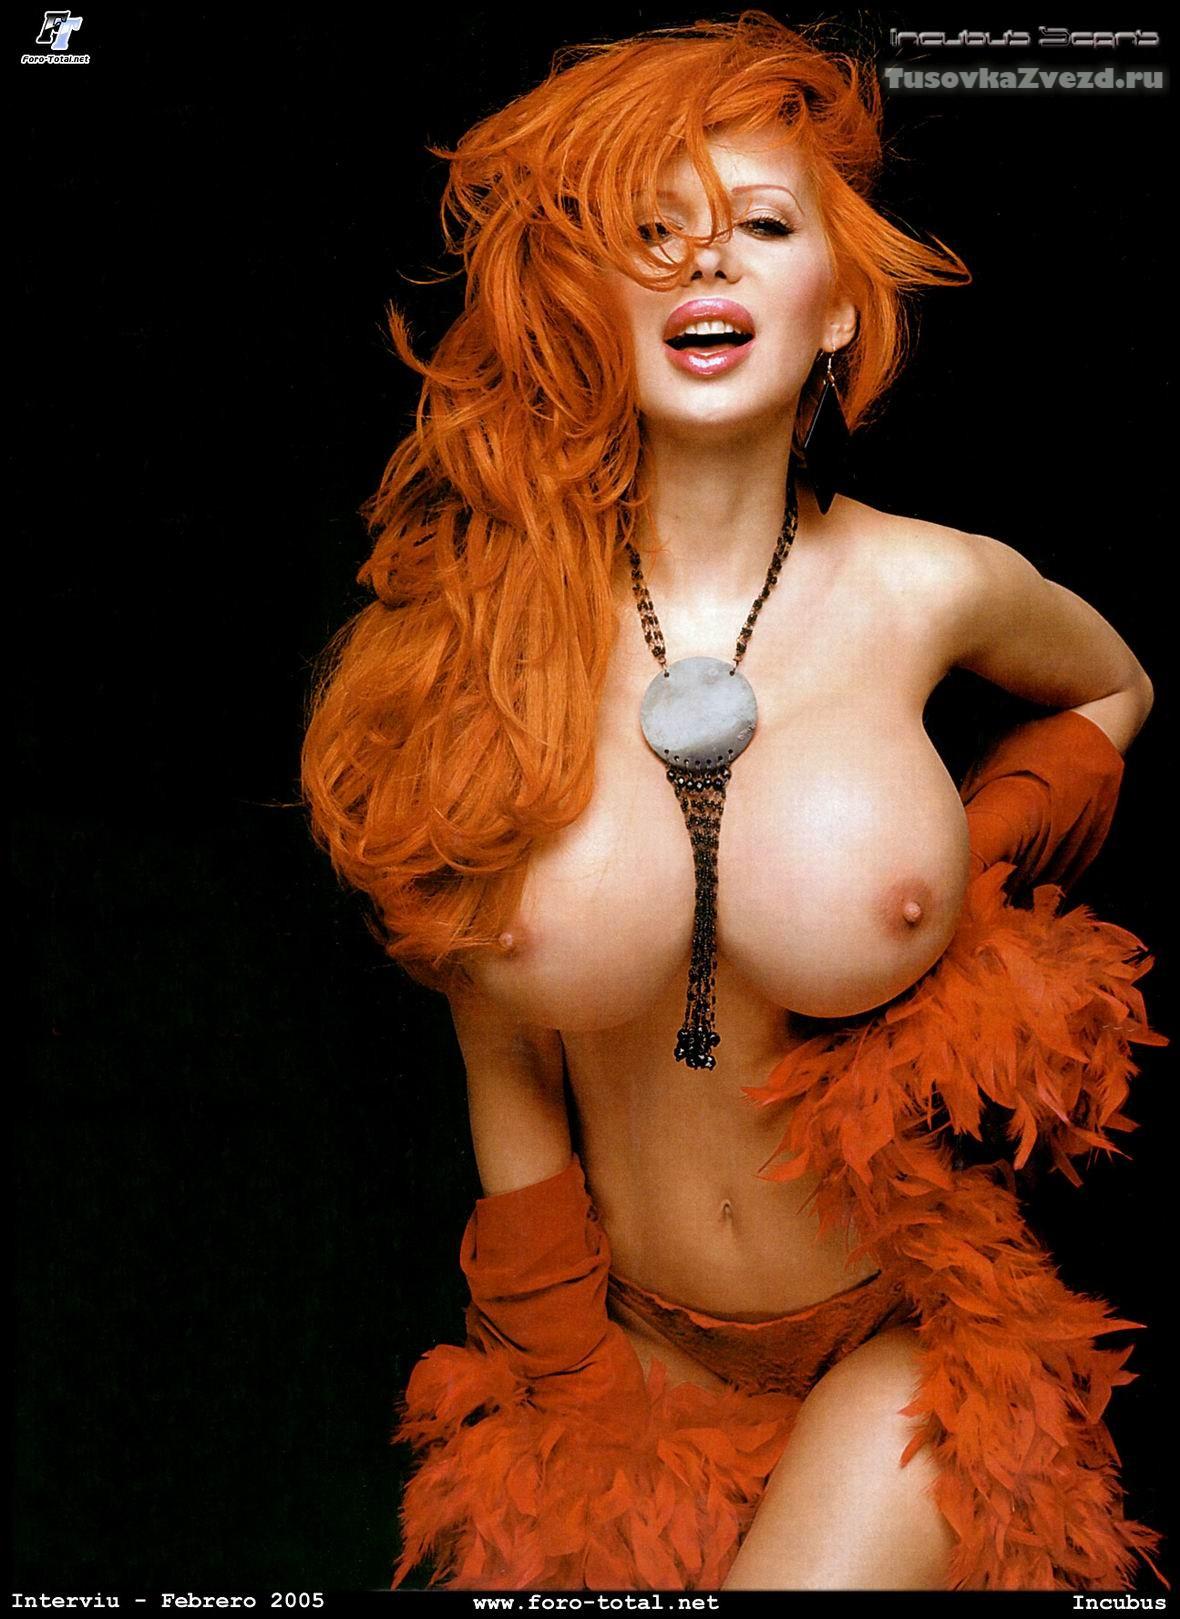 Сабрина фото порно